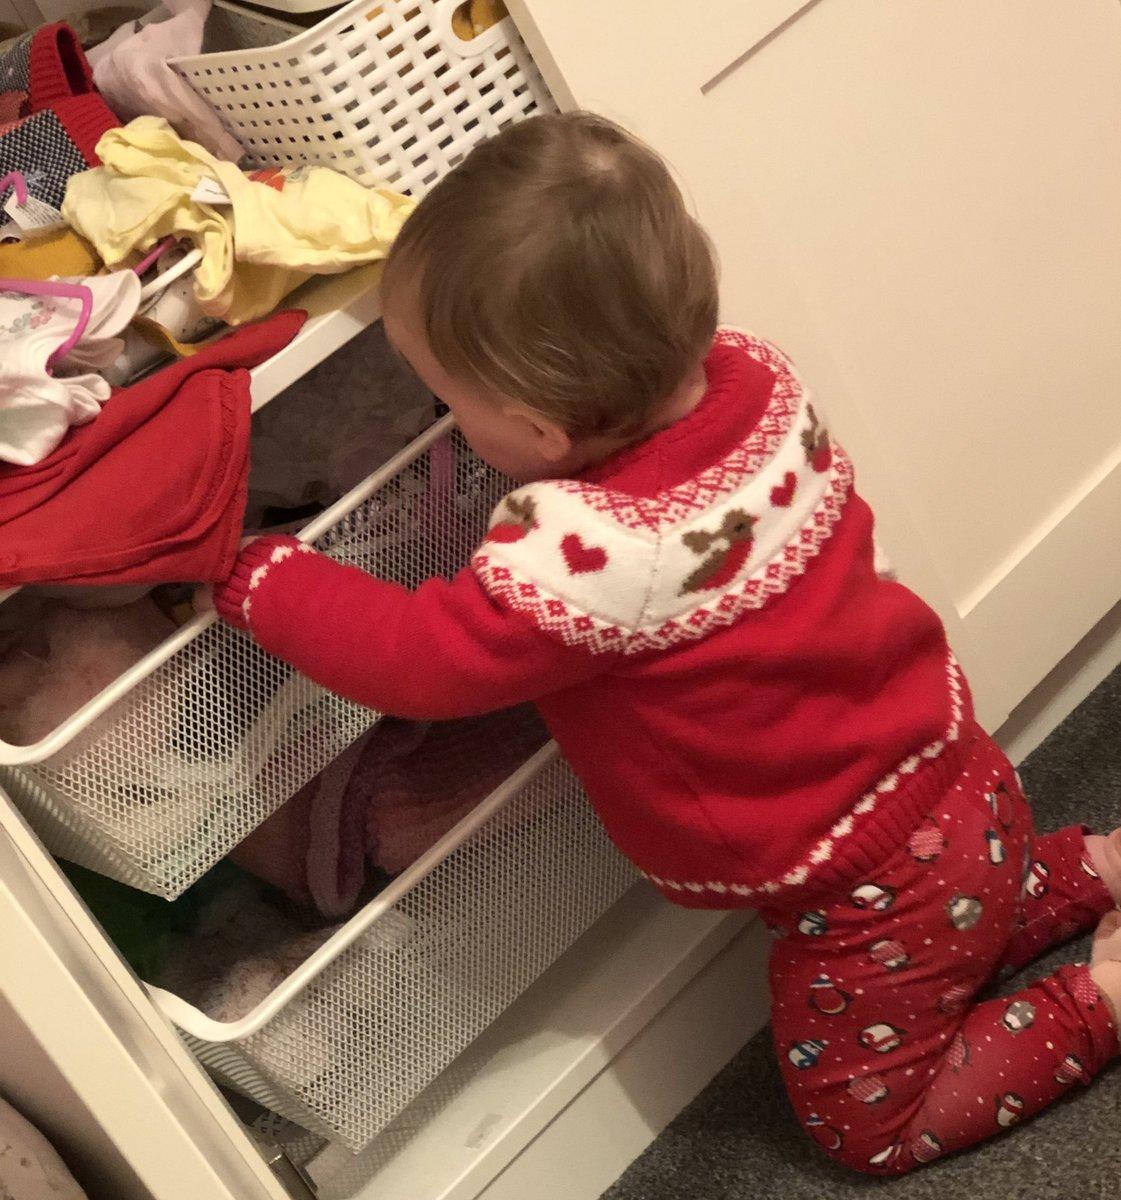 Just organising her wardrobe #babyheidi #christmasjumperpic.twitter.com/i2iazN1IPm